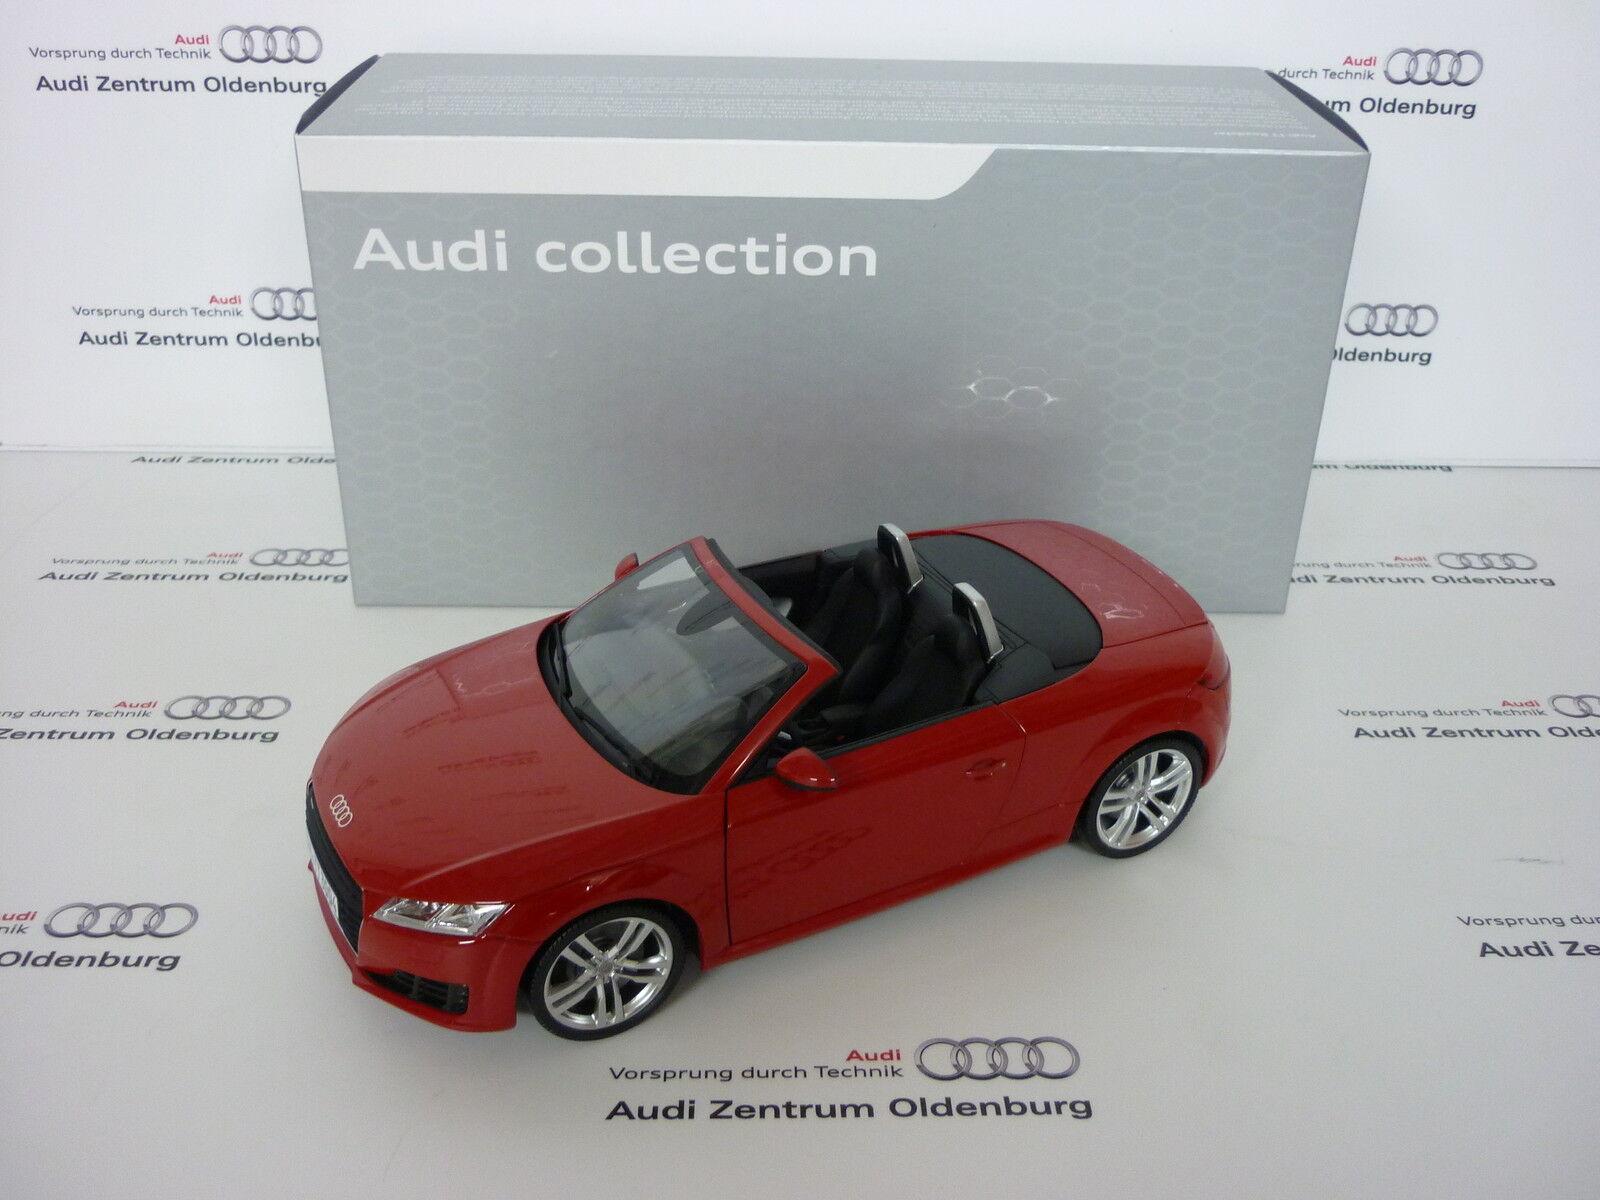 Audi TT Roadster, 1 18, TangGoldt, NEU OVP  | Die Farbe ist sehr auffällig